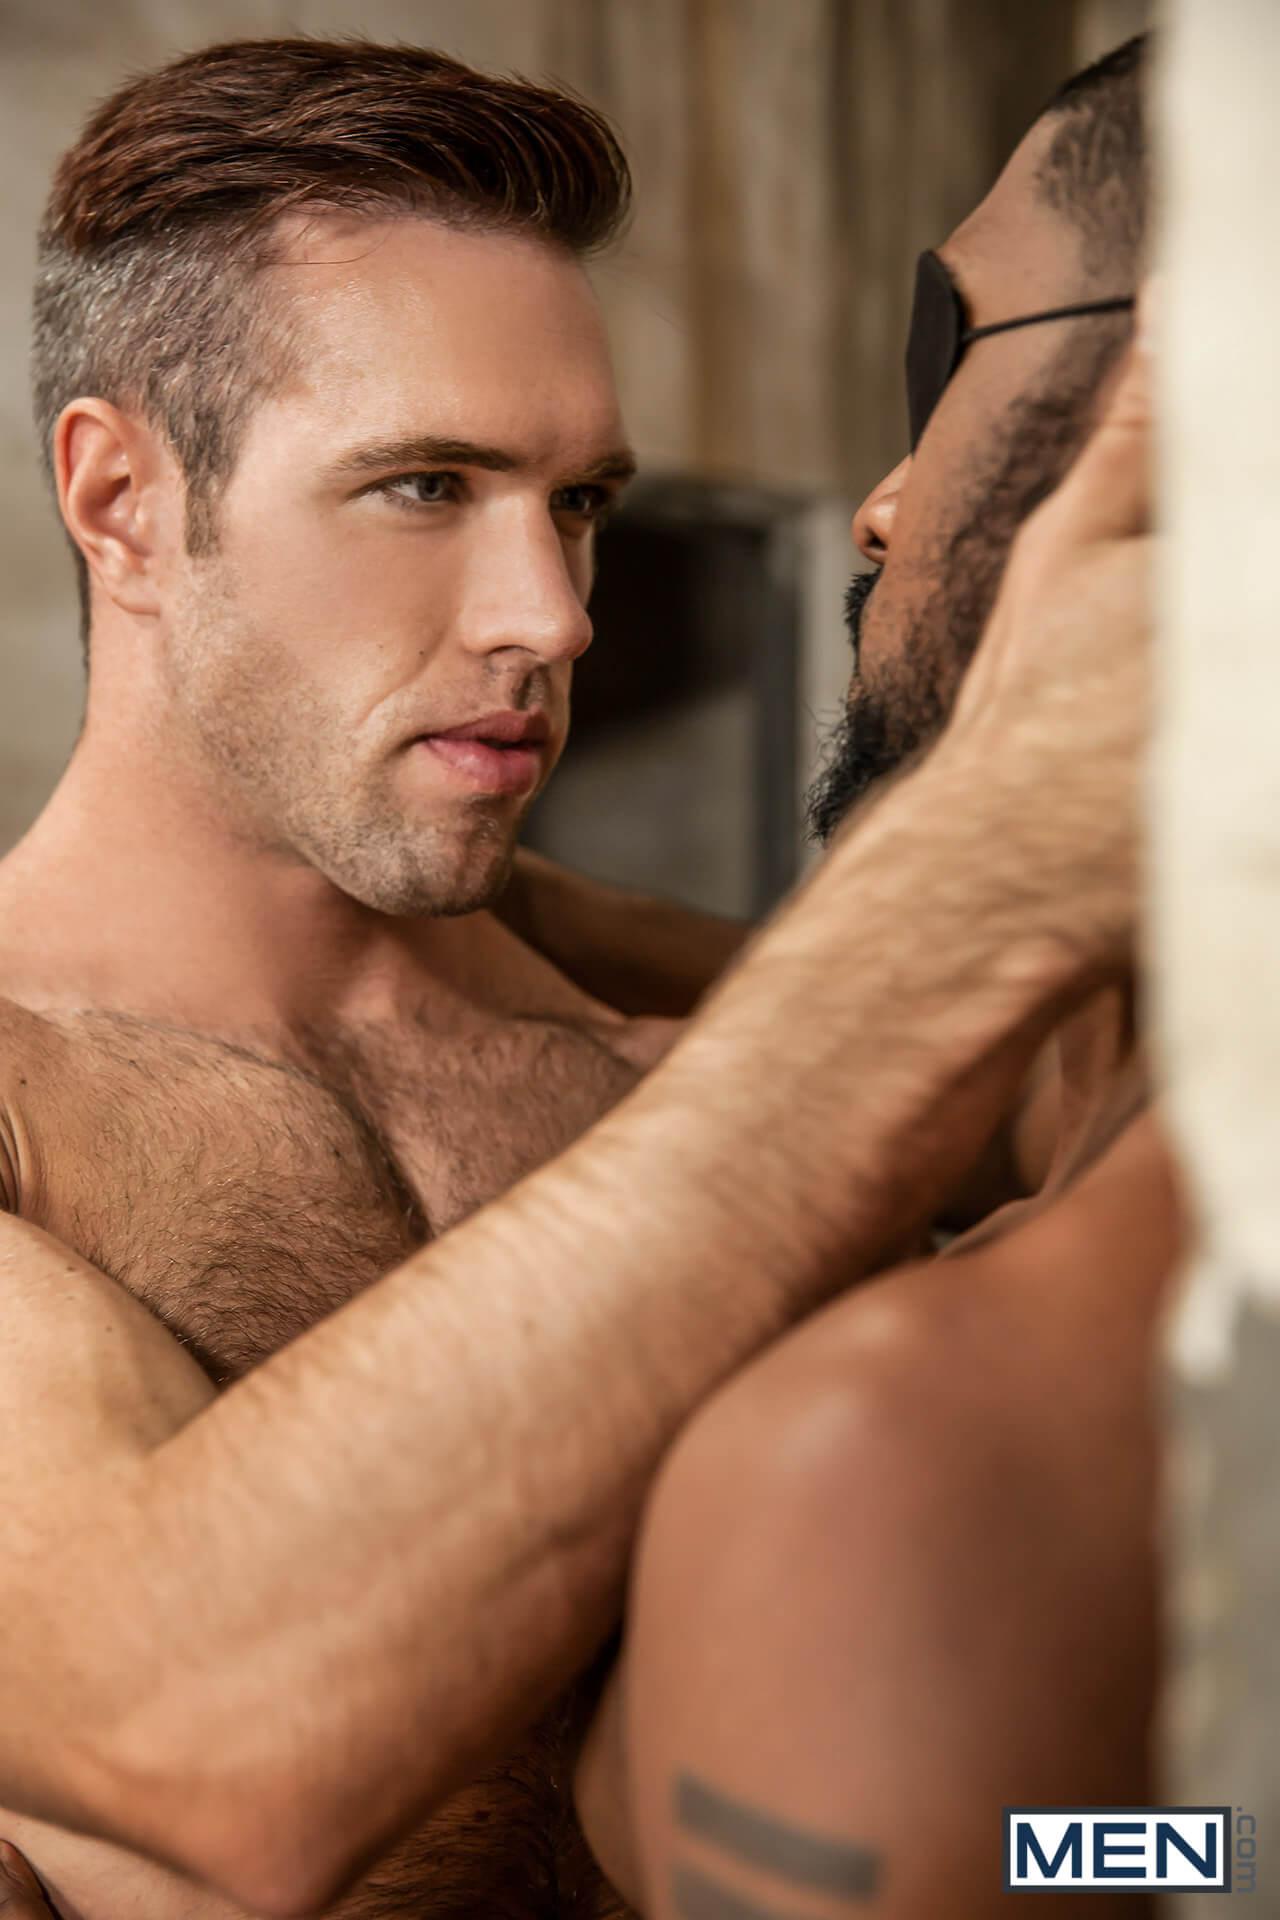 Men Super Gay Hero Captain America A Gay Parody Part Alex Mecum Gay Porn Blog Image 4